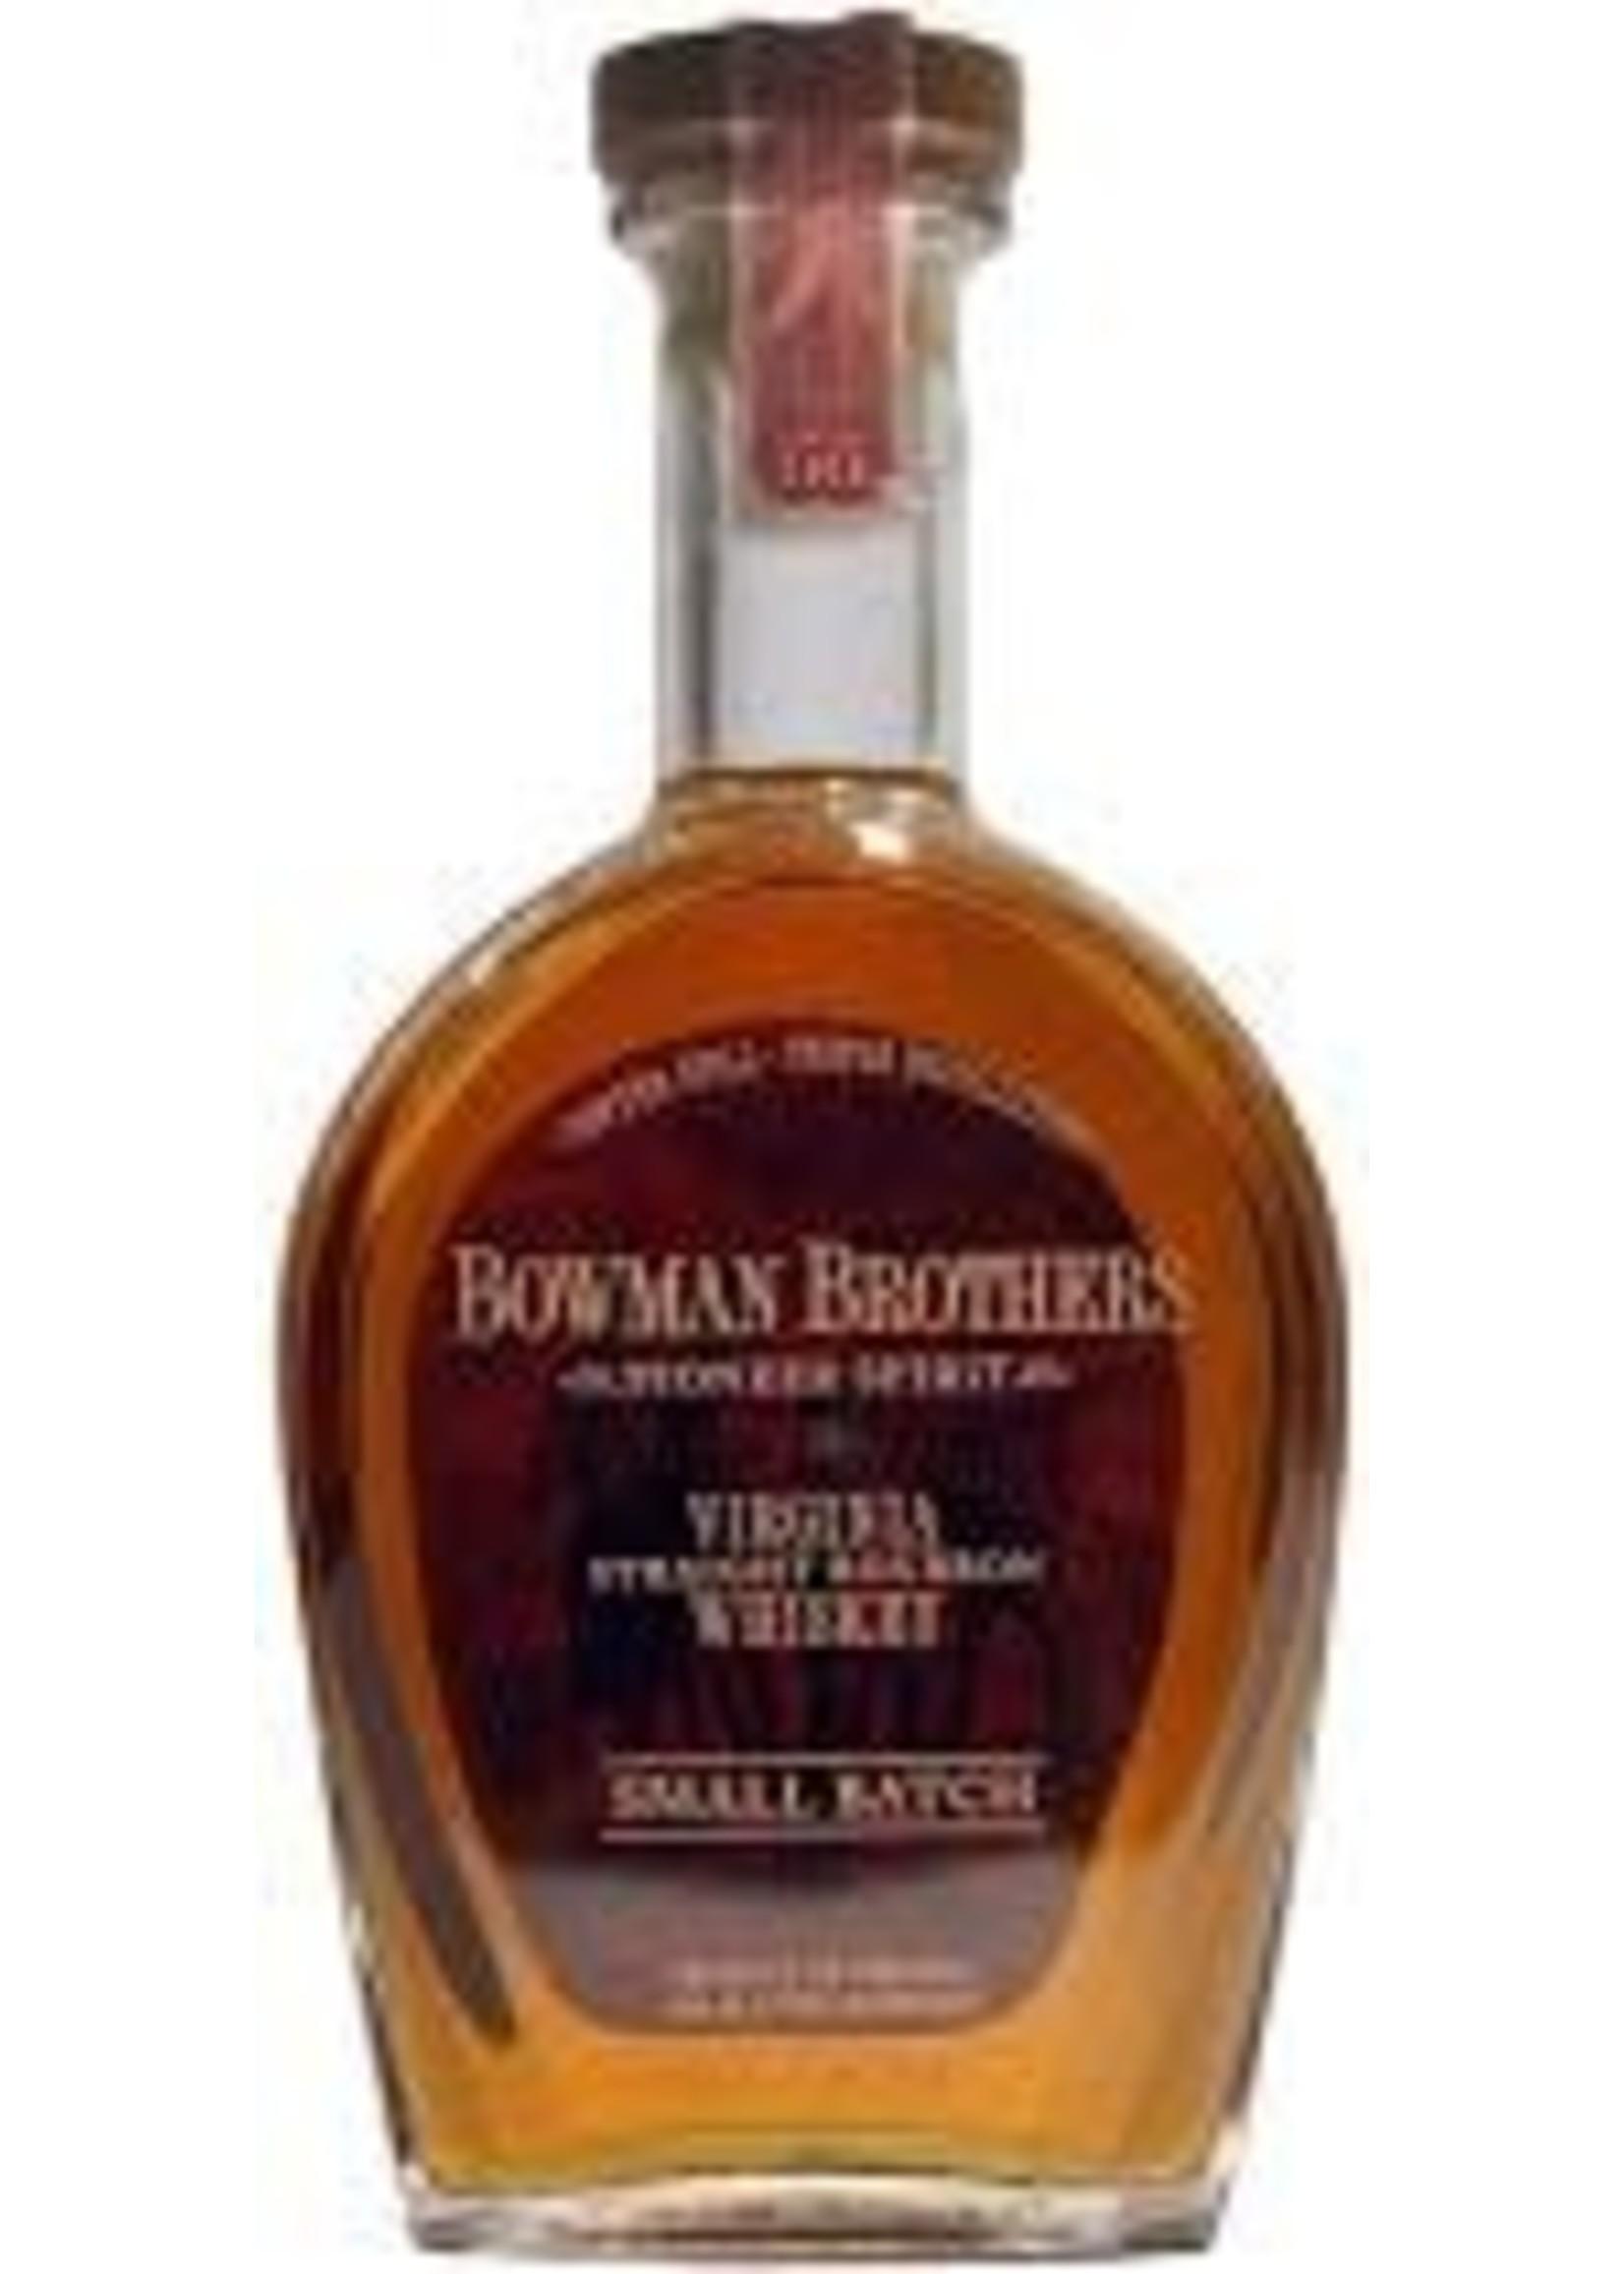 Bowman Brothers Virginia Straight Bourbon Whiskey 90 PF 750ml